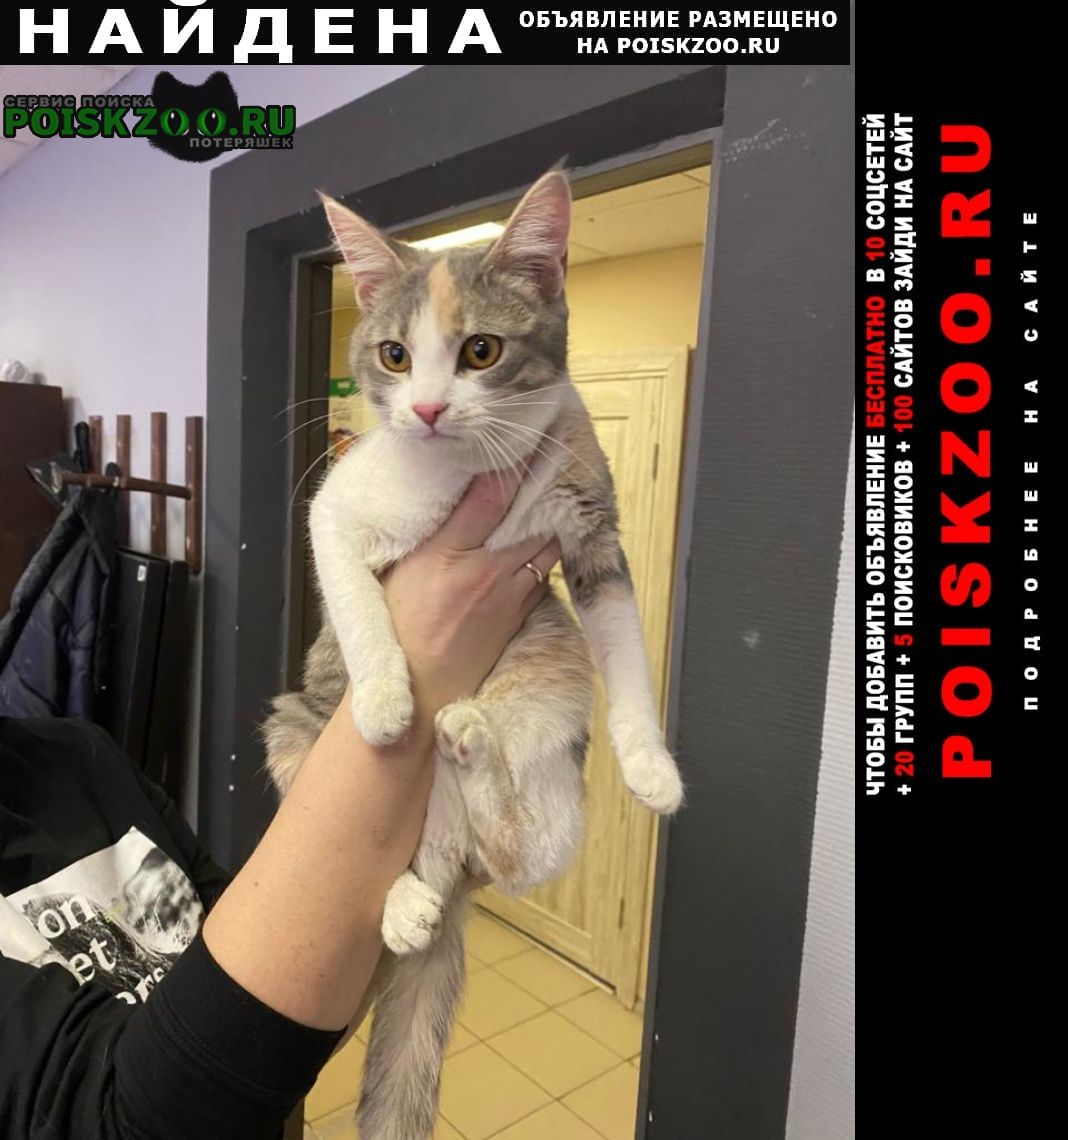 Найдена кошка район покровское стрешнево Москва